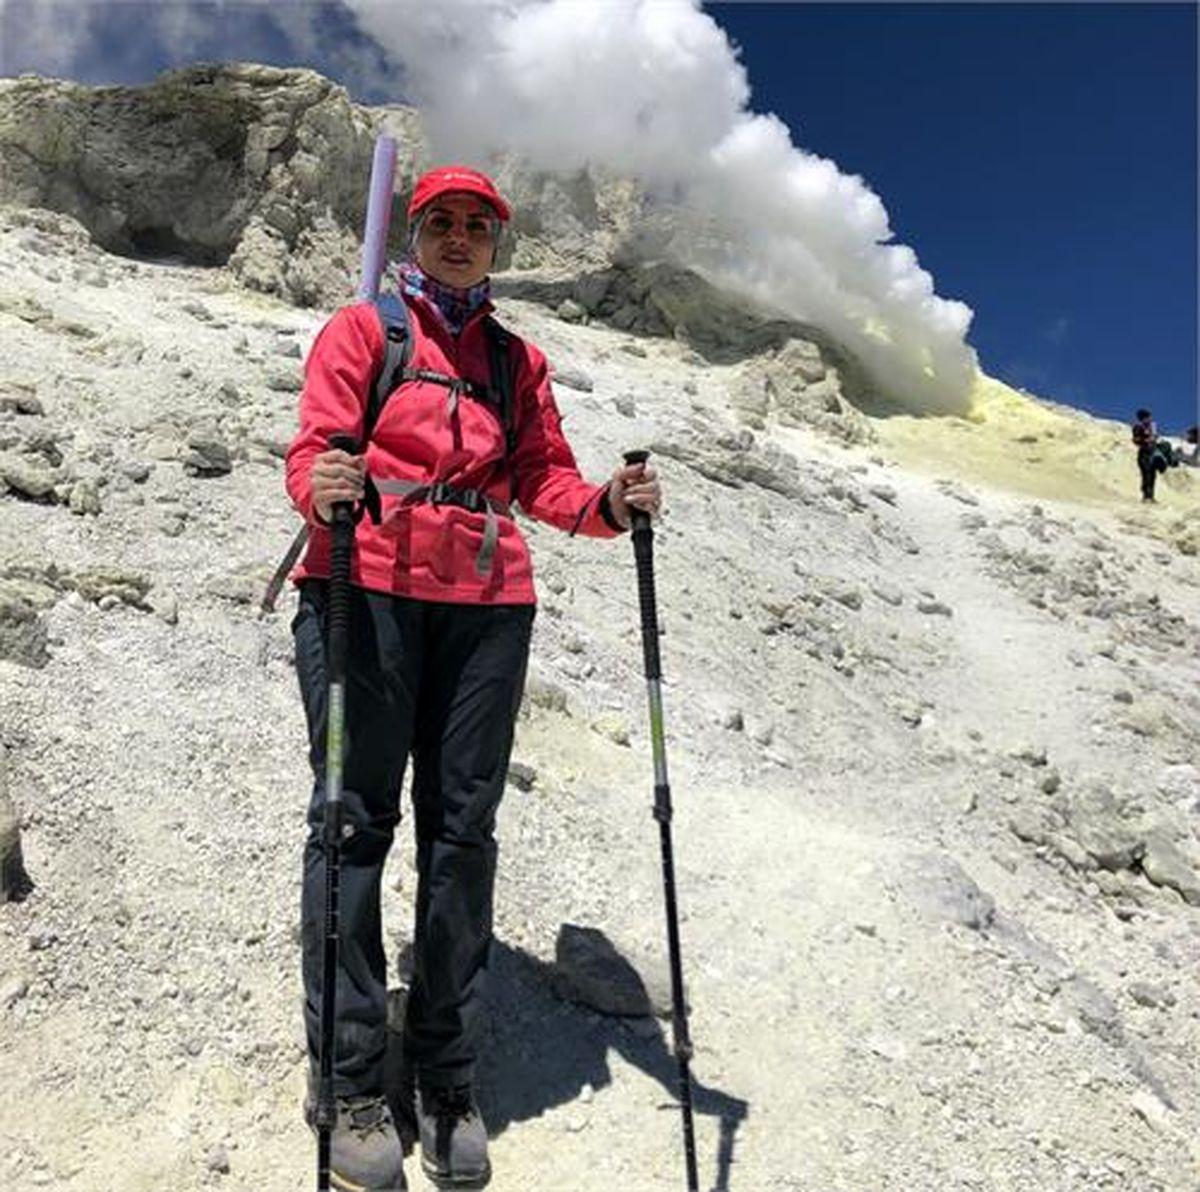 صعود مستقل بانوی کوهنورد فولادی به قله دماوند